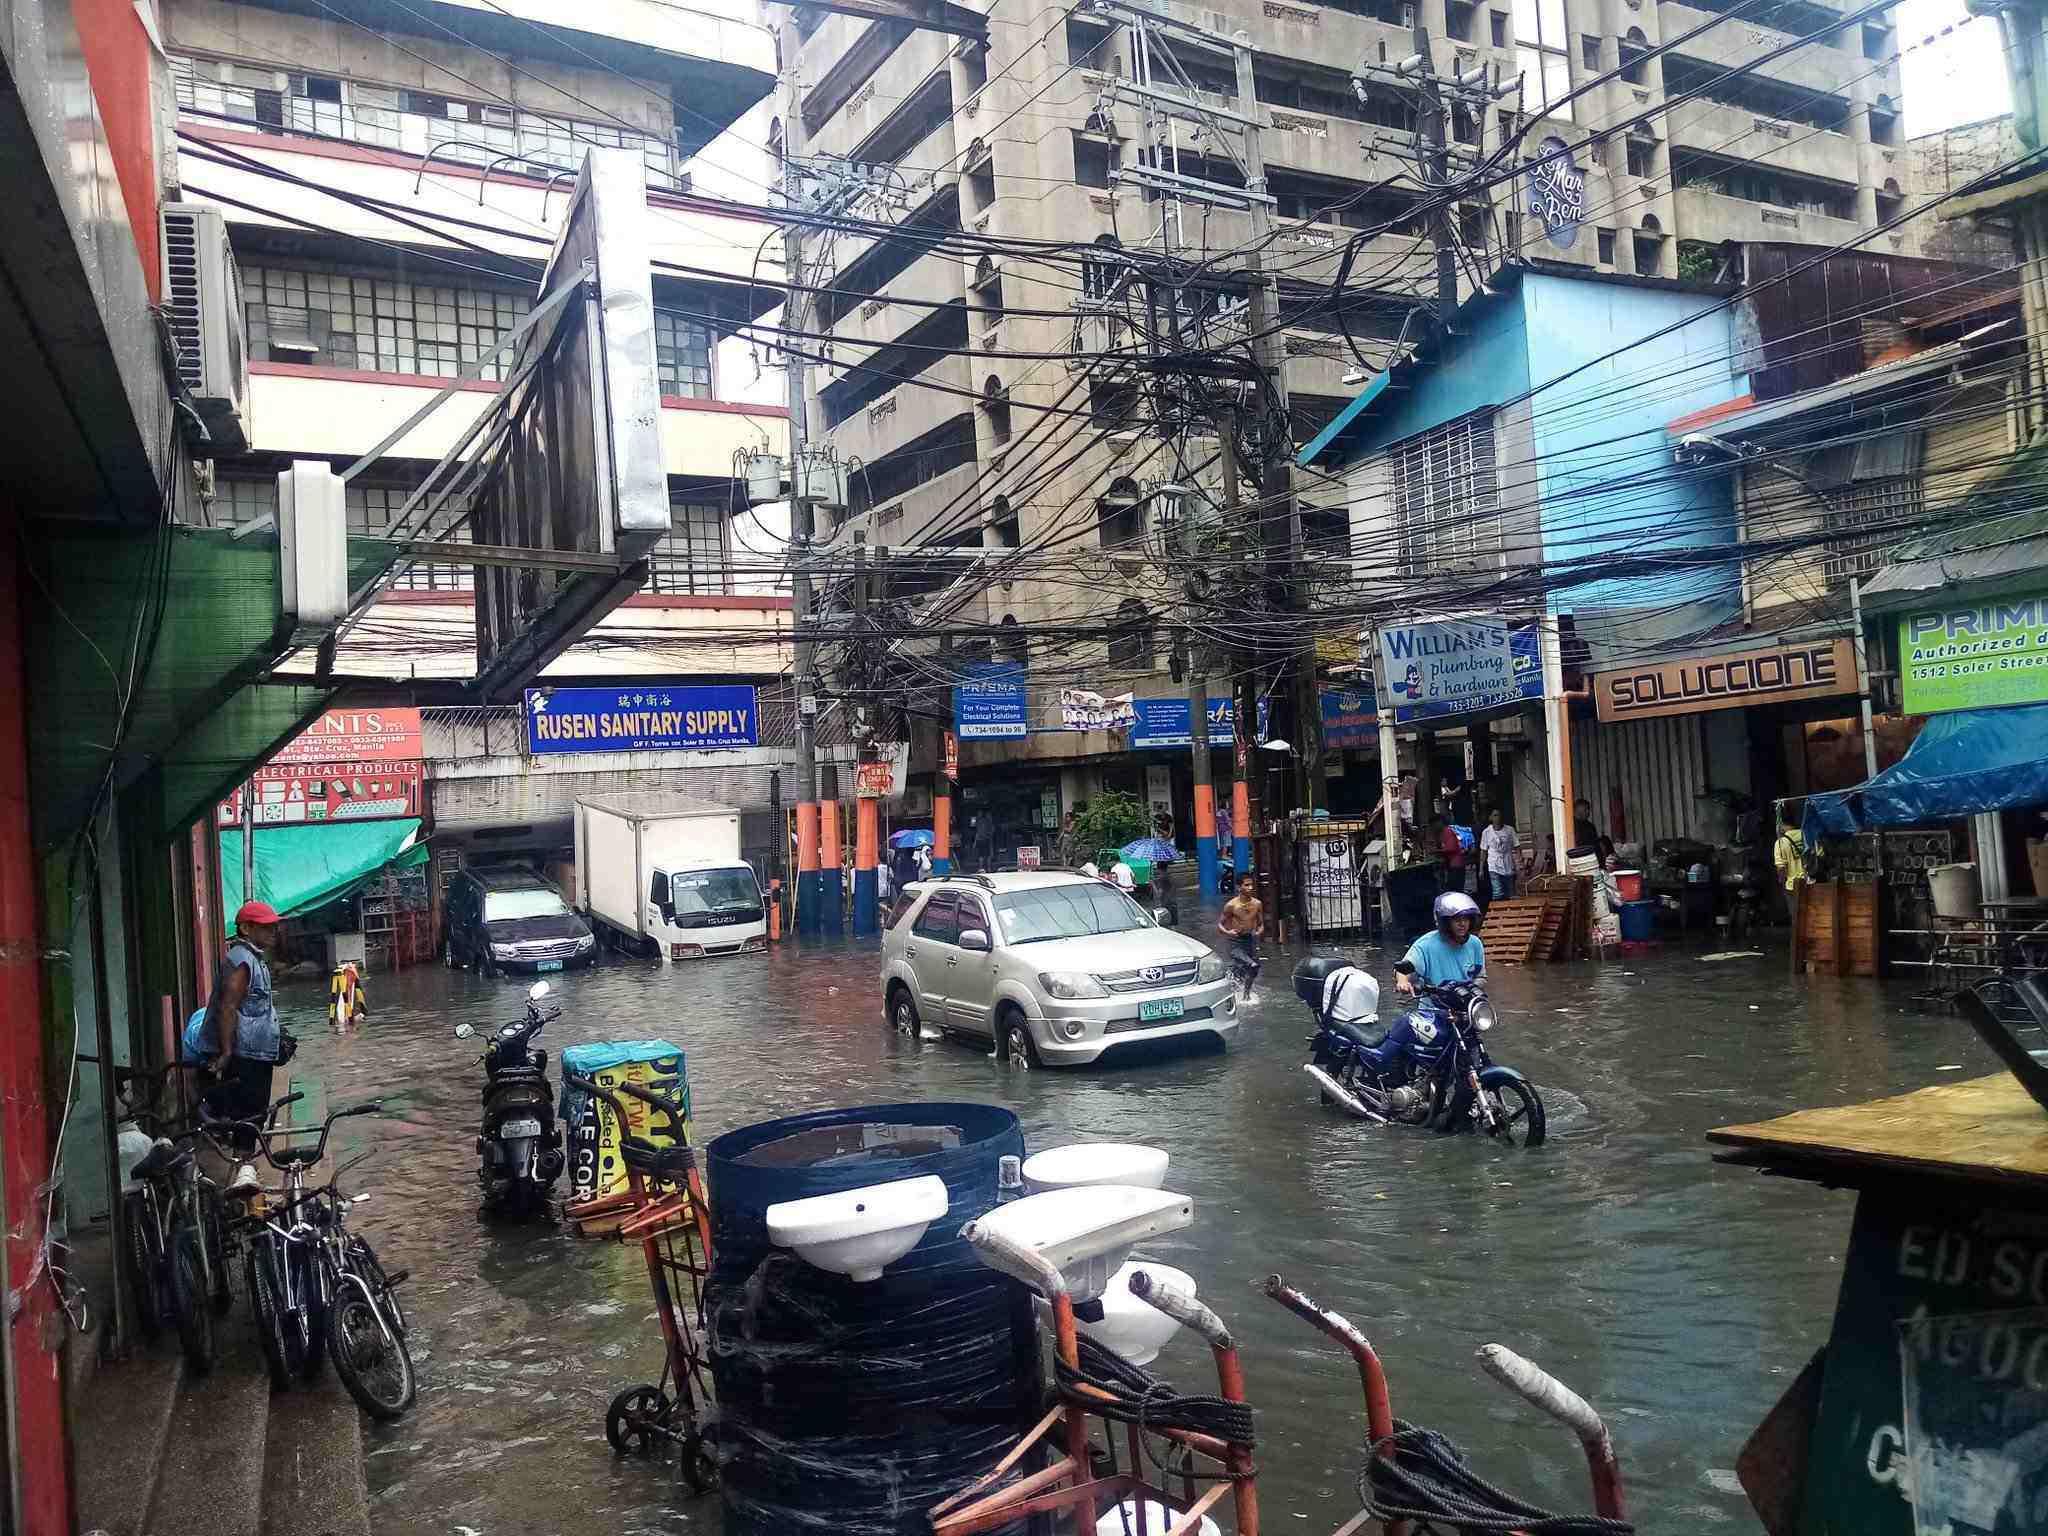 FLORENTINO Street in Sta. Cruz, Manila. Photo by Twitter user @travelferdie